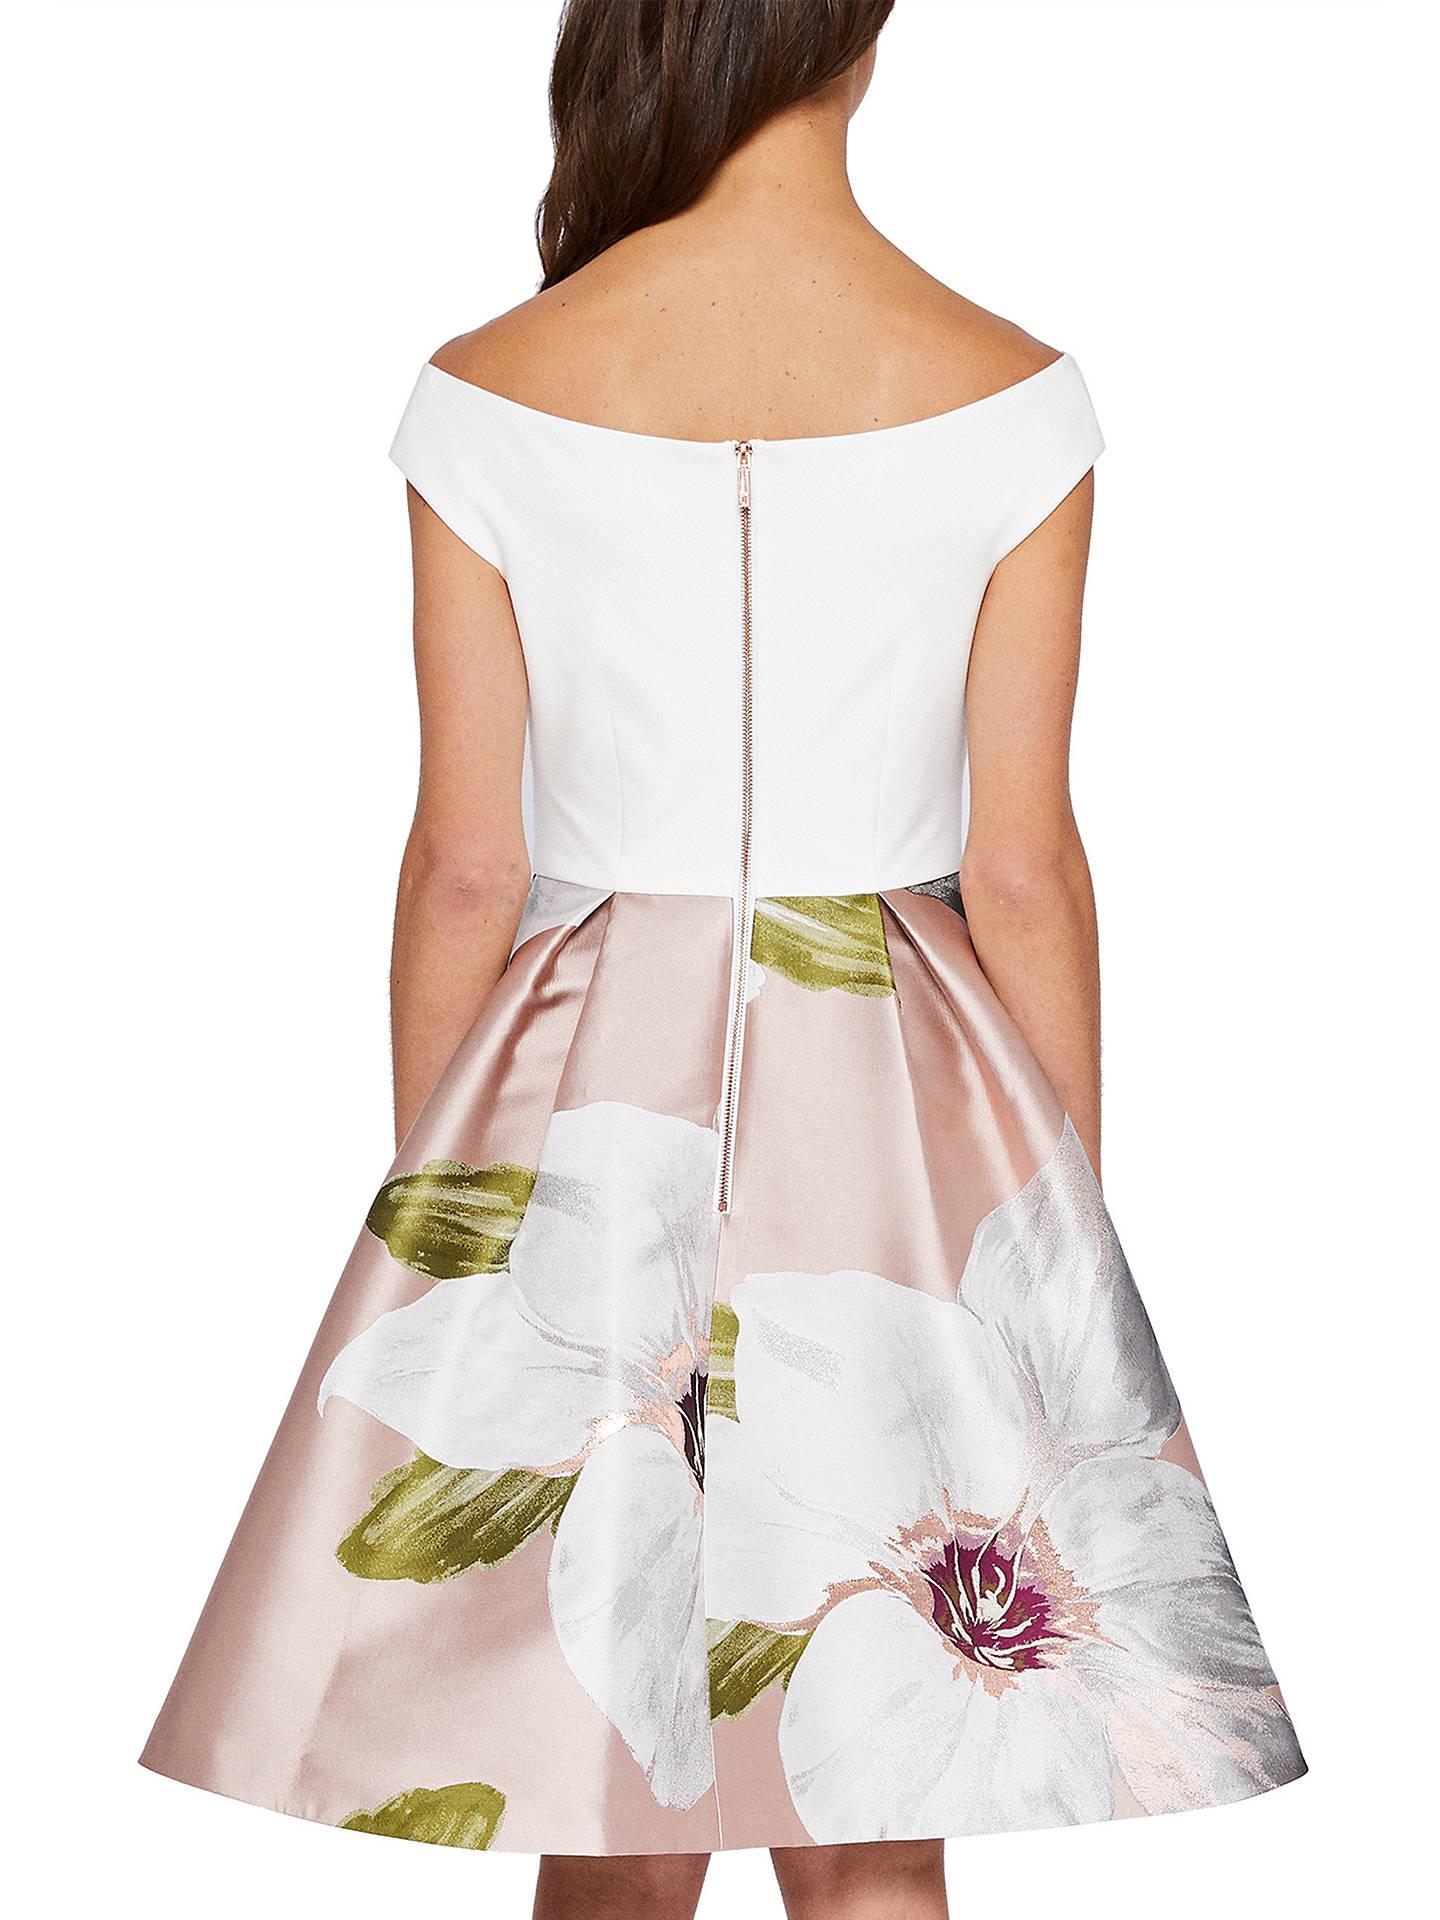 b5069c971e90 ... Buy Ted Baker Chatsworth Jacquard Dress